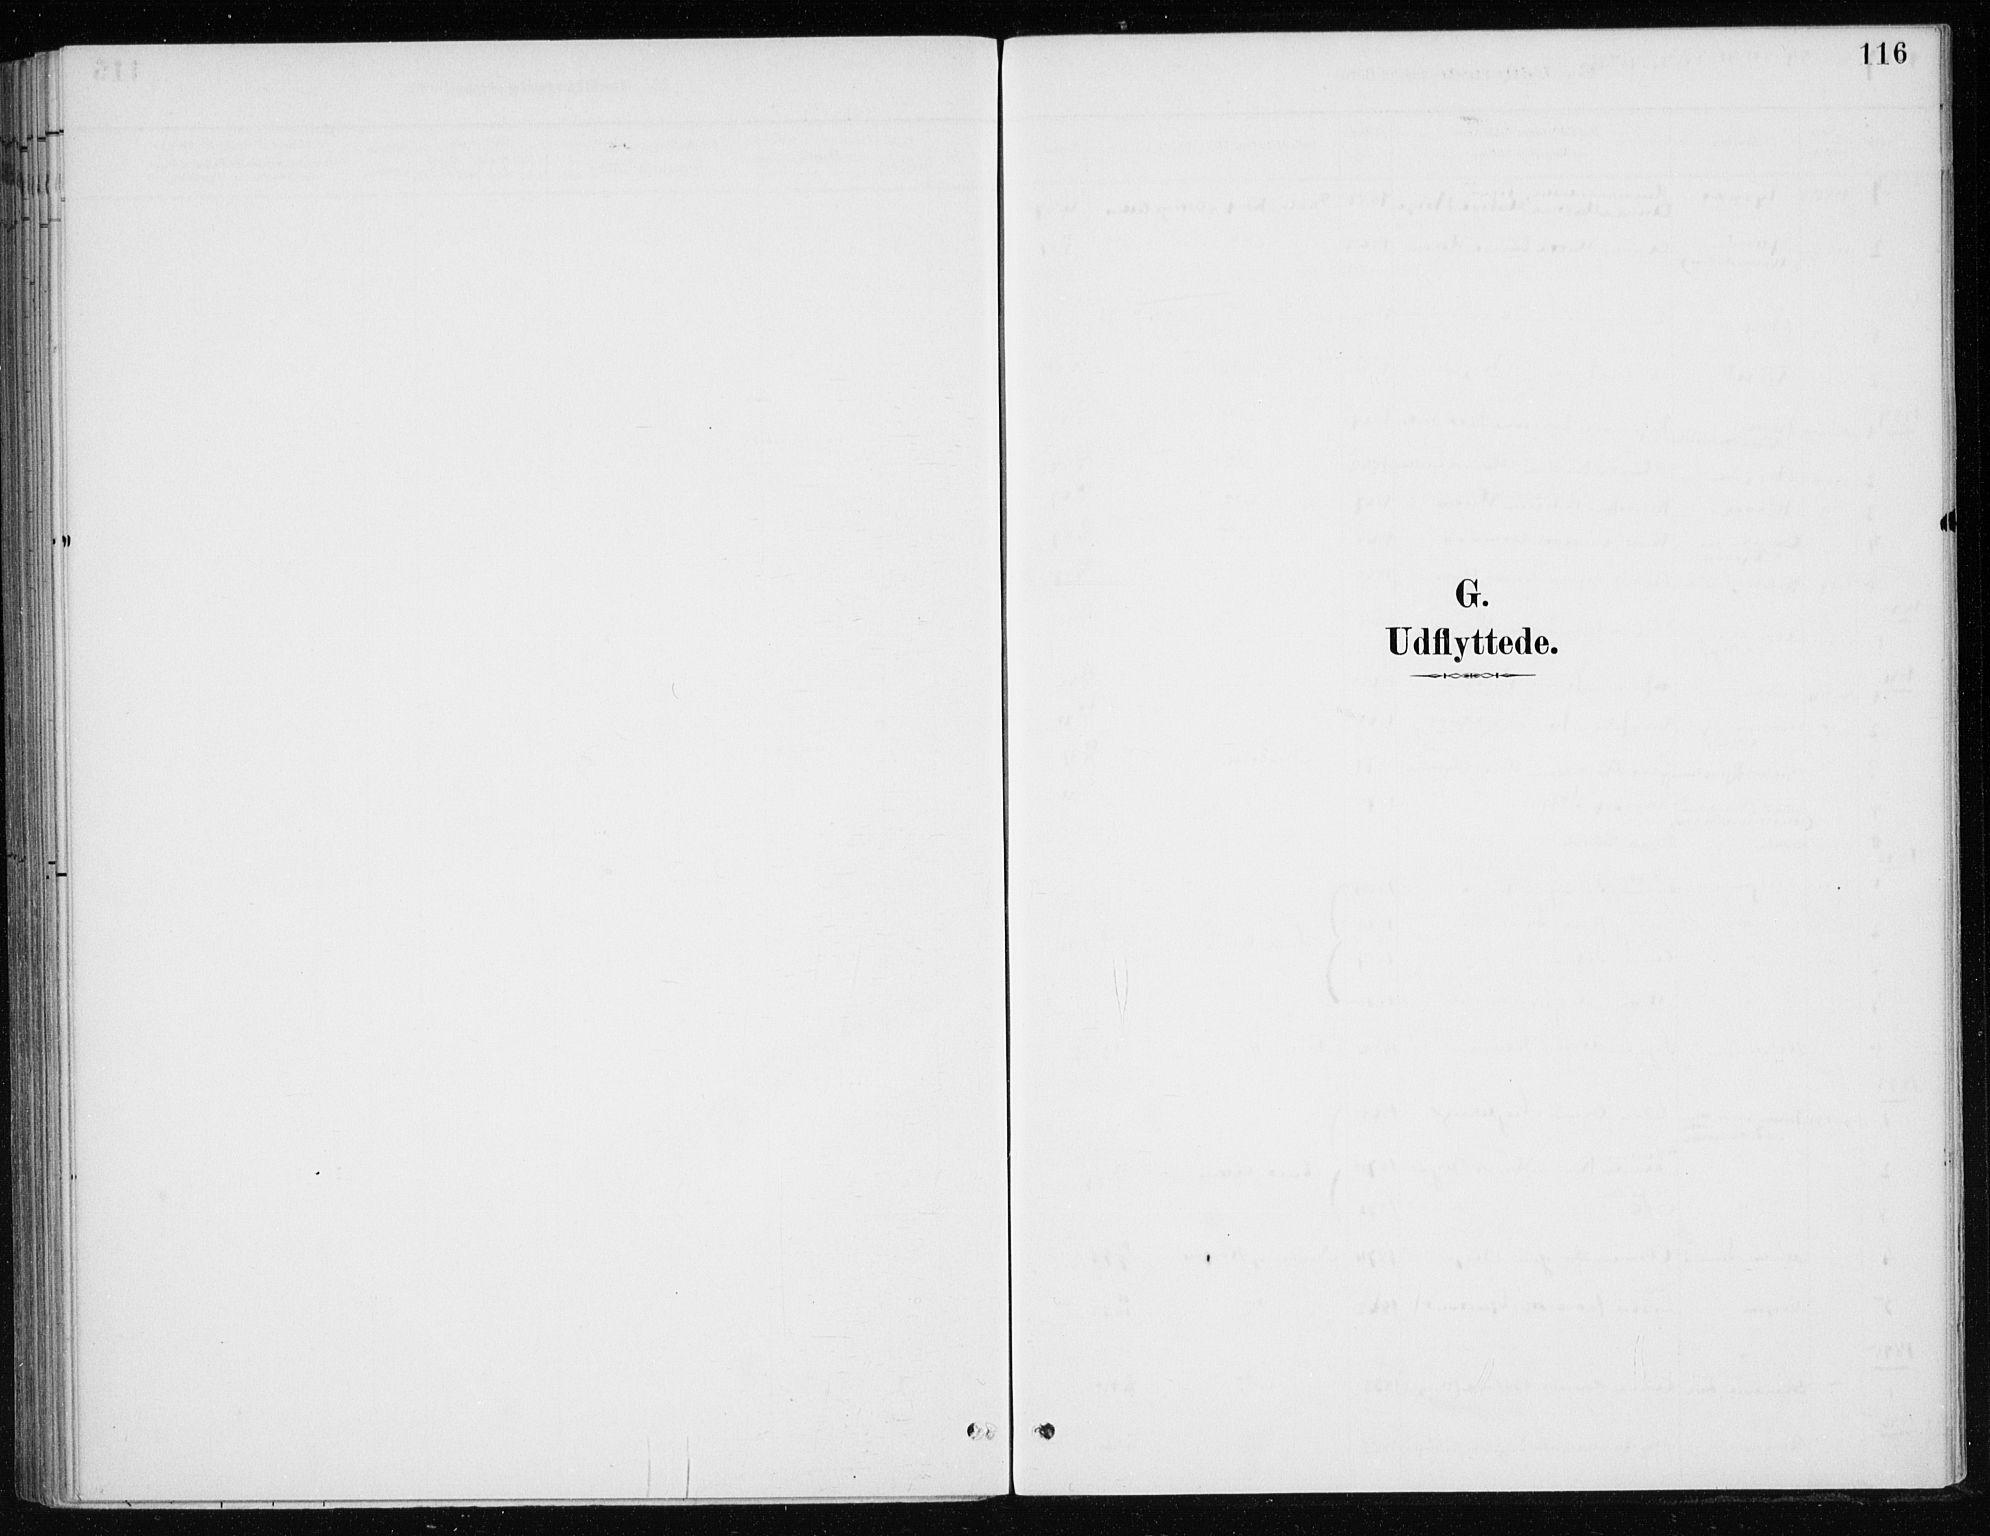 SAB, Kvinnherad Sokneprestembete, H/Haa: Ministerialbok nr. E 1, 1887-1912, s. 116